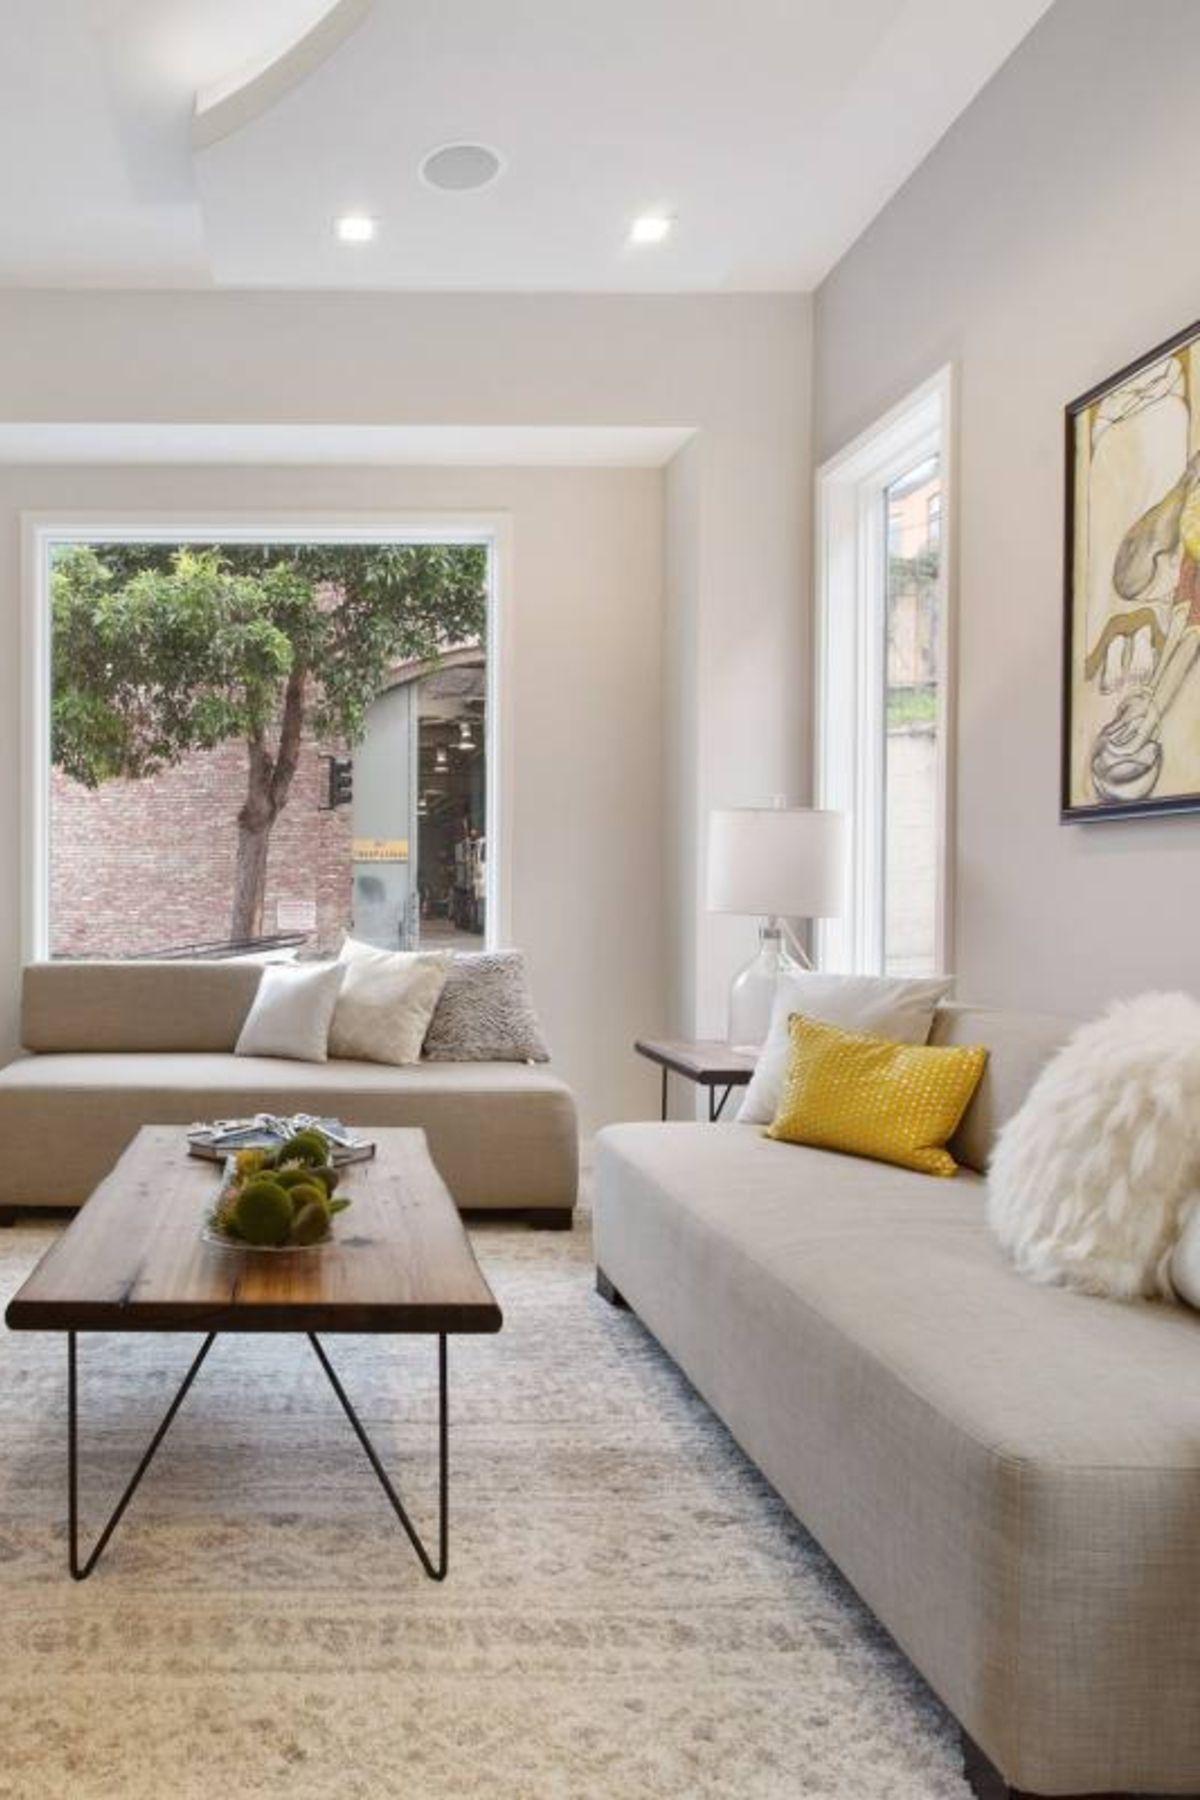 Room redo: Minimalist Contemporary Neutral living room